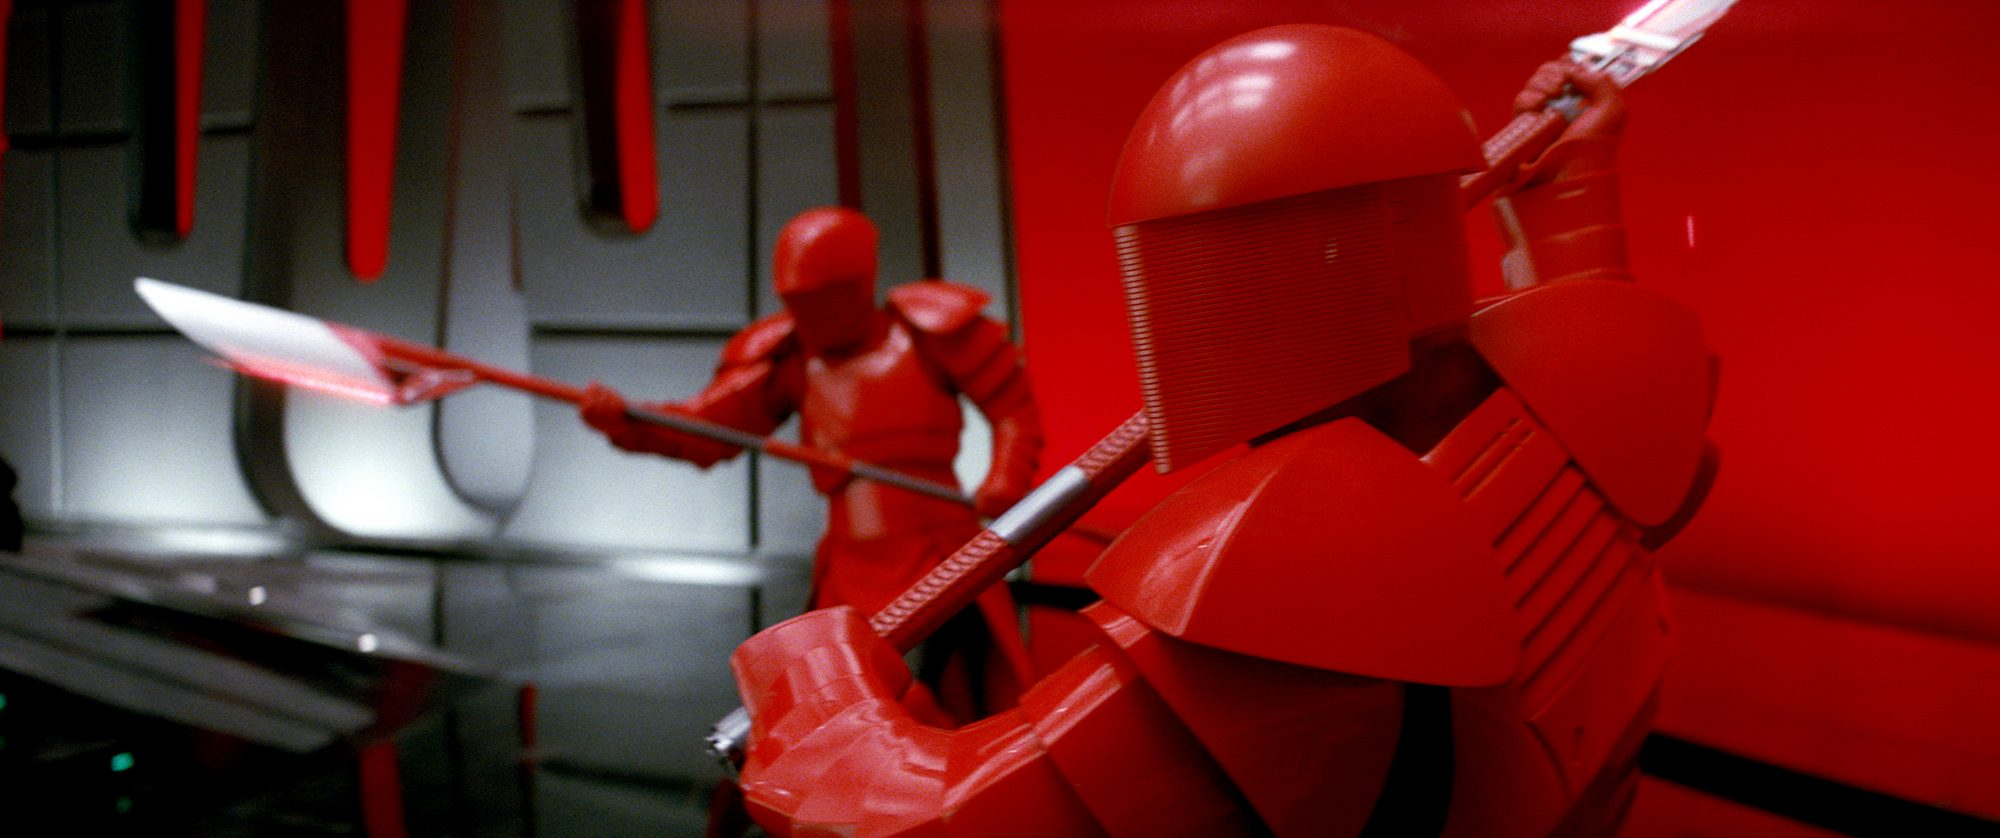 2.) Snoke's throne room inStar Wars: The Last Jed (Spoilers)